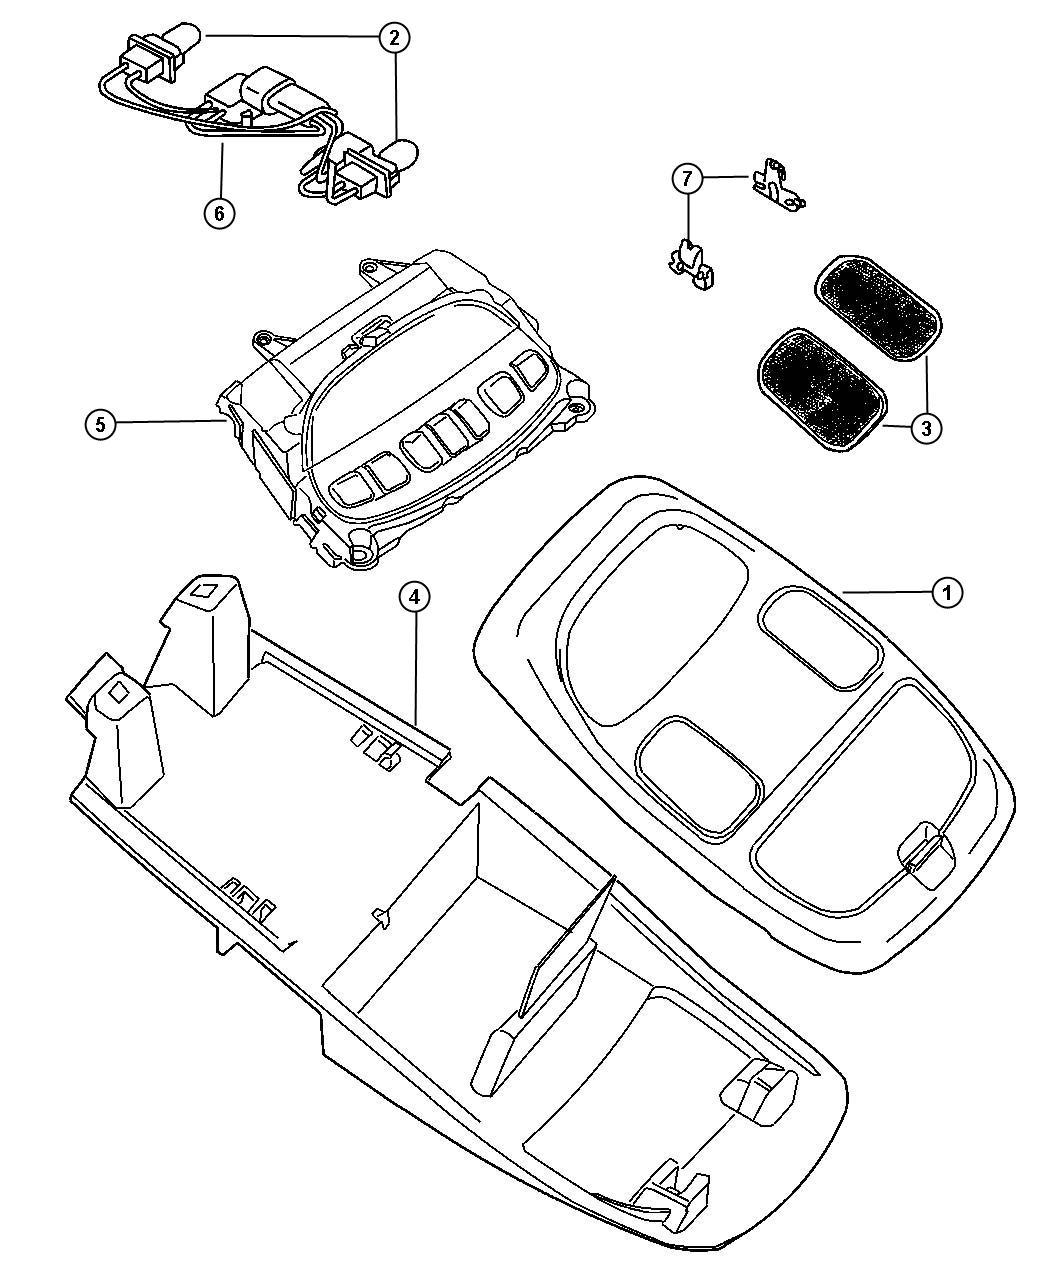 2009 Dodge Ram 5500 Wiring. Overhead console. Trim: [all